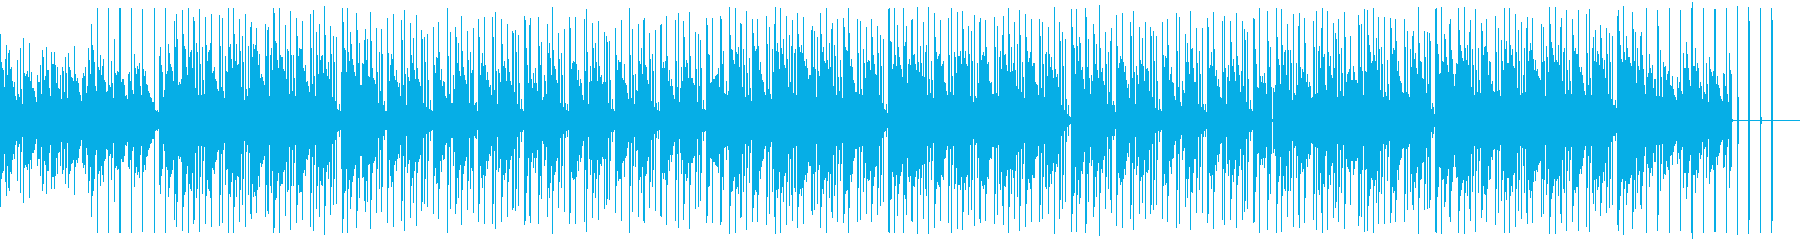 CMや企業VPにチルで爽やかヒップホップの再生済みの波形